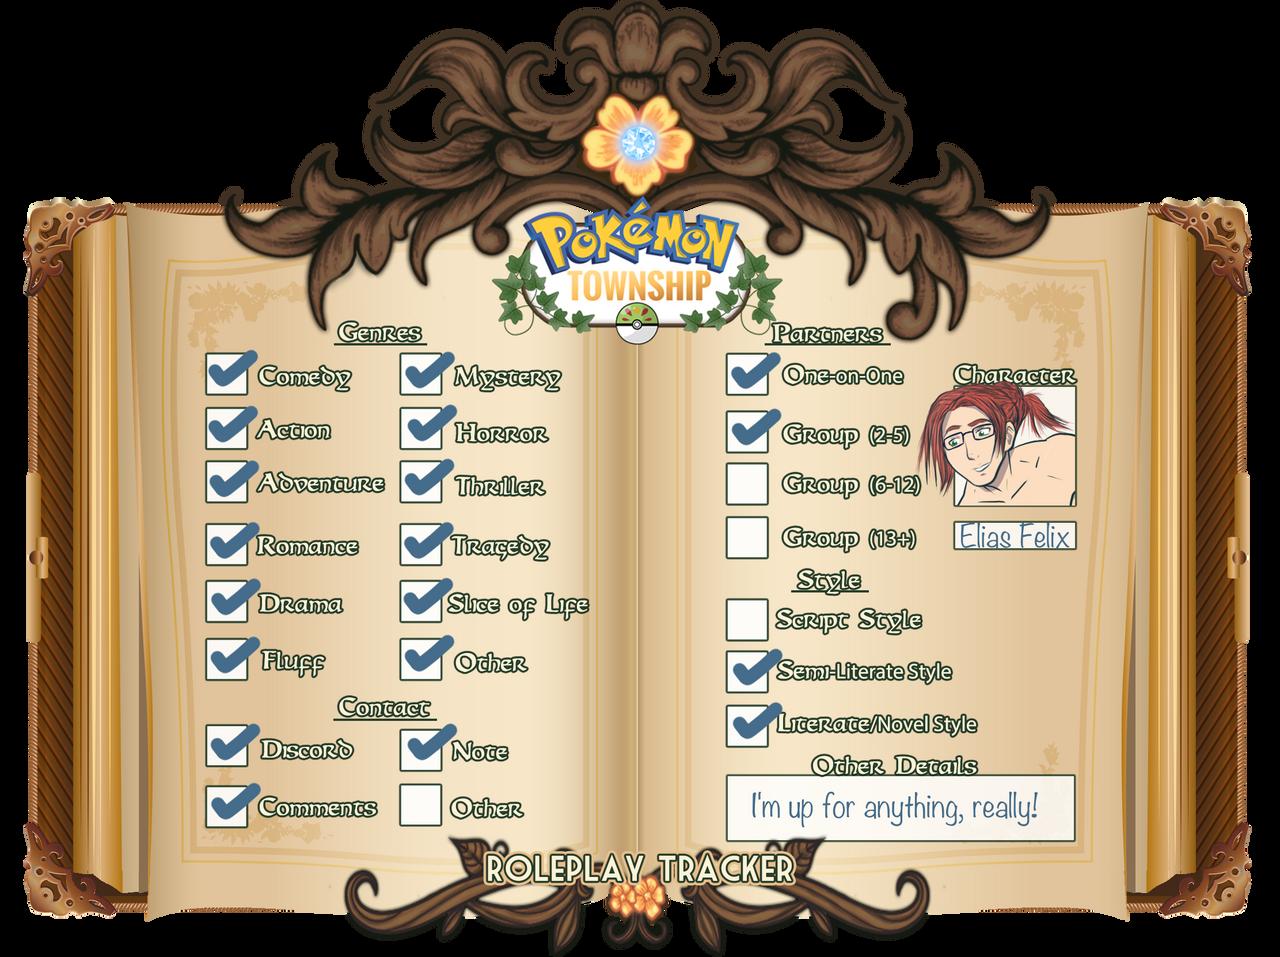 Discord Tracker pts: elias felix || roleplay trackersushisheik on deviantart